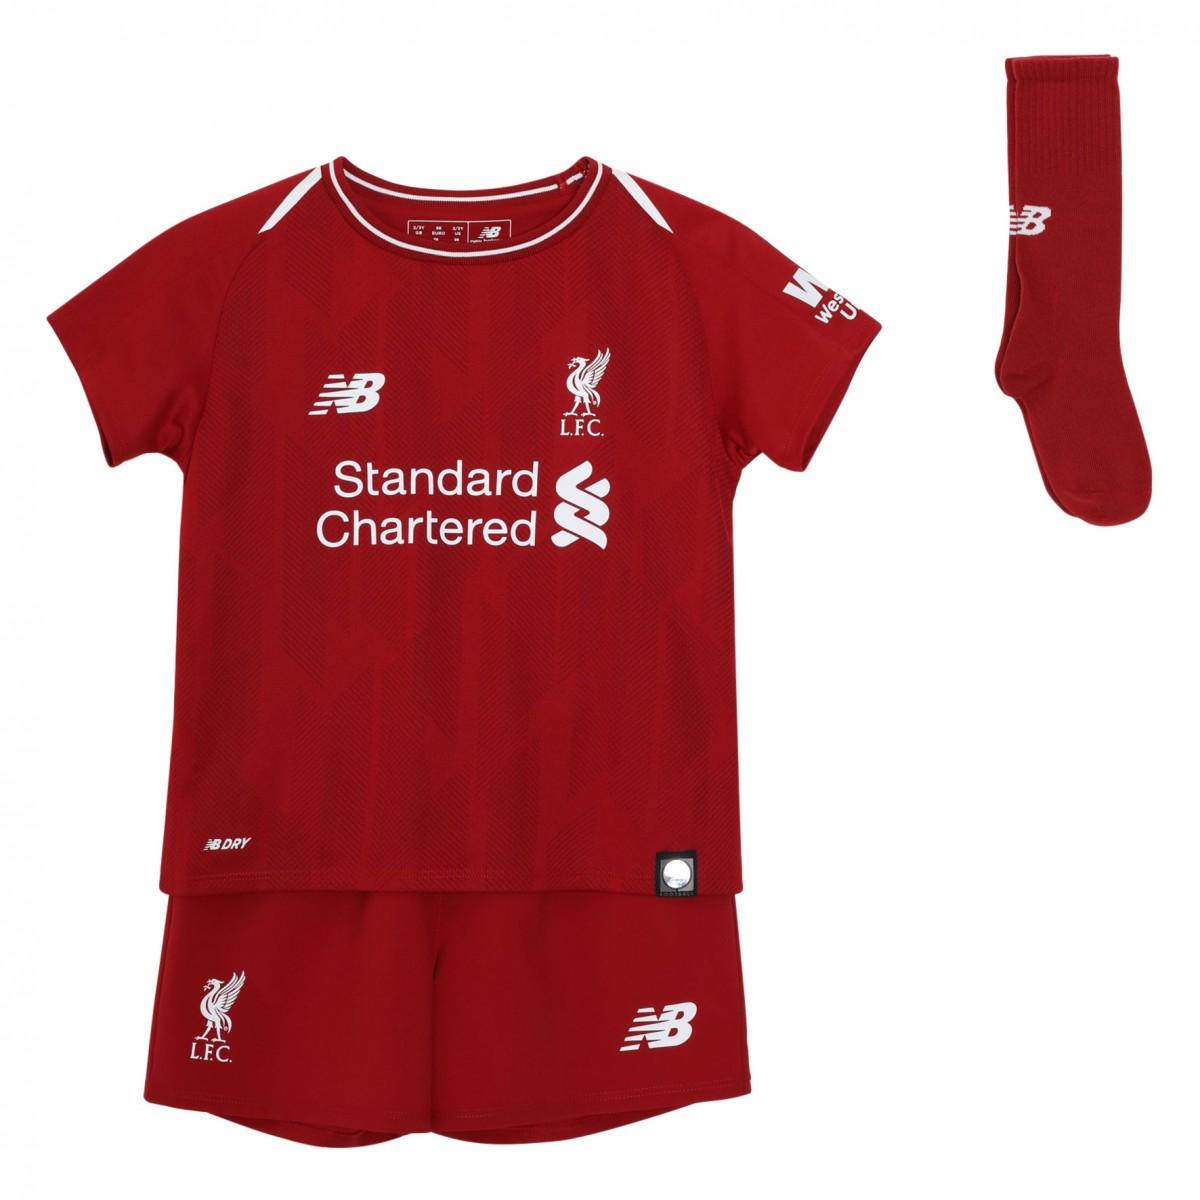 abc448f2b 2018-2019 Liverpool Home Little Boys Mini Kit  IY830039  - Uksoccershop